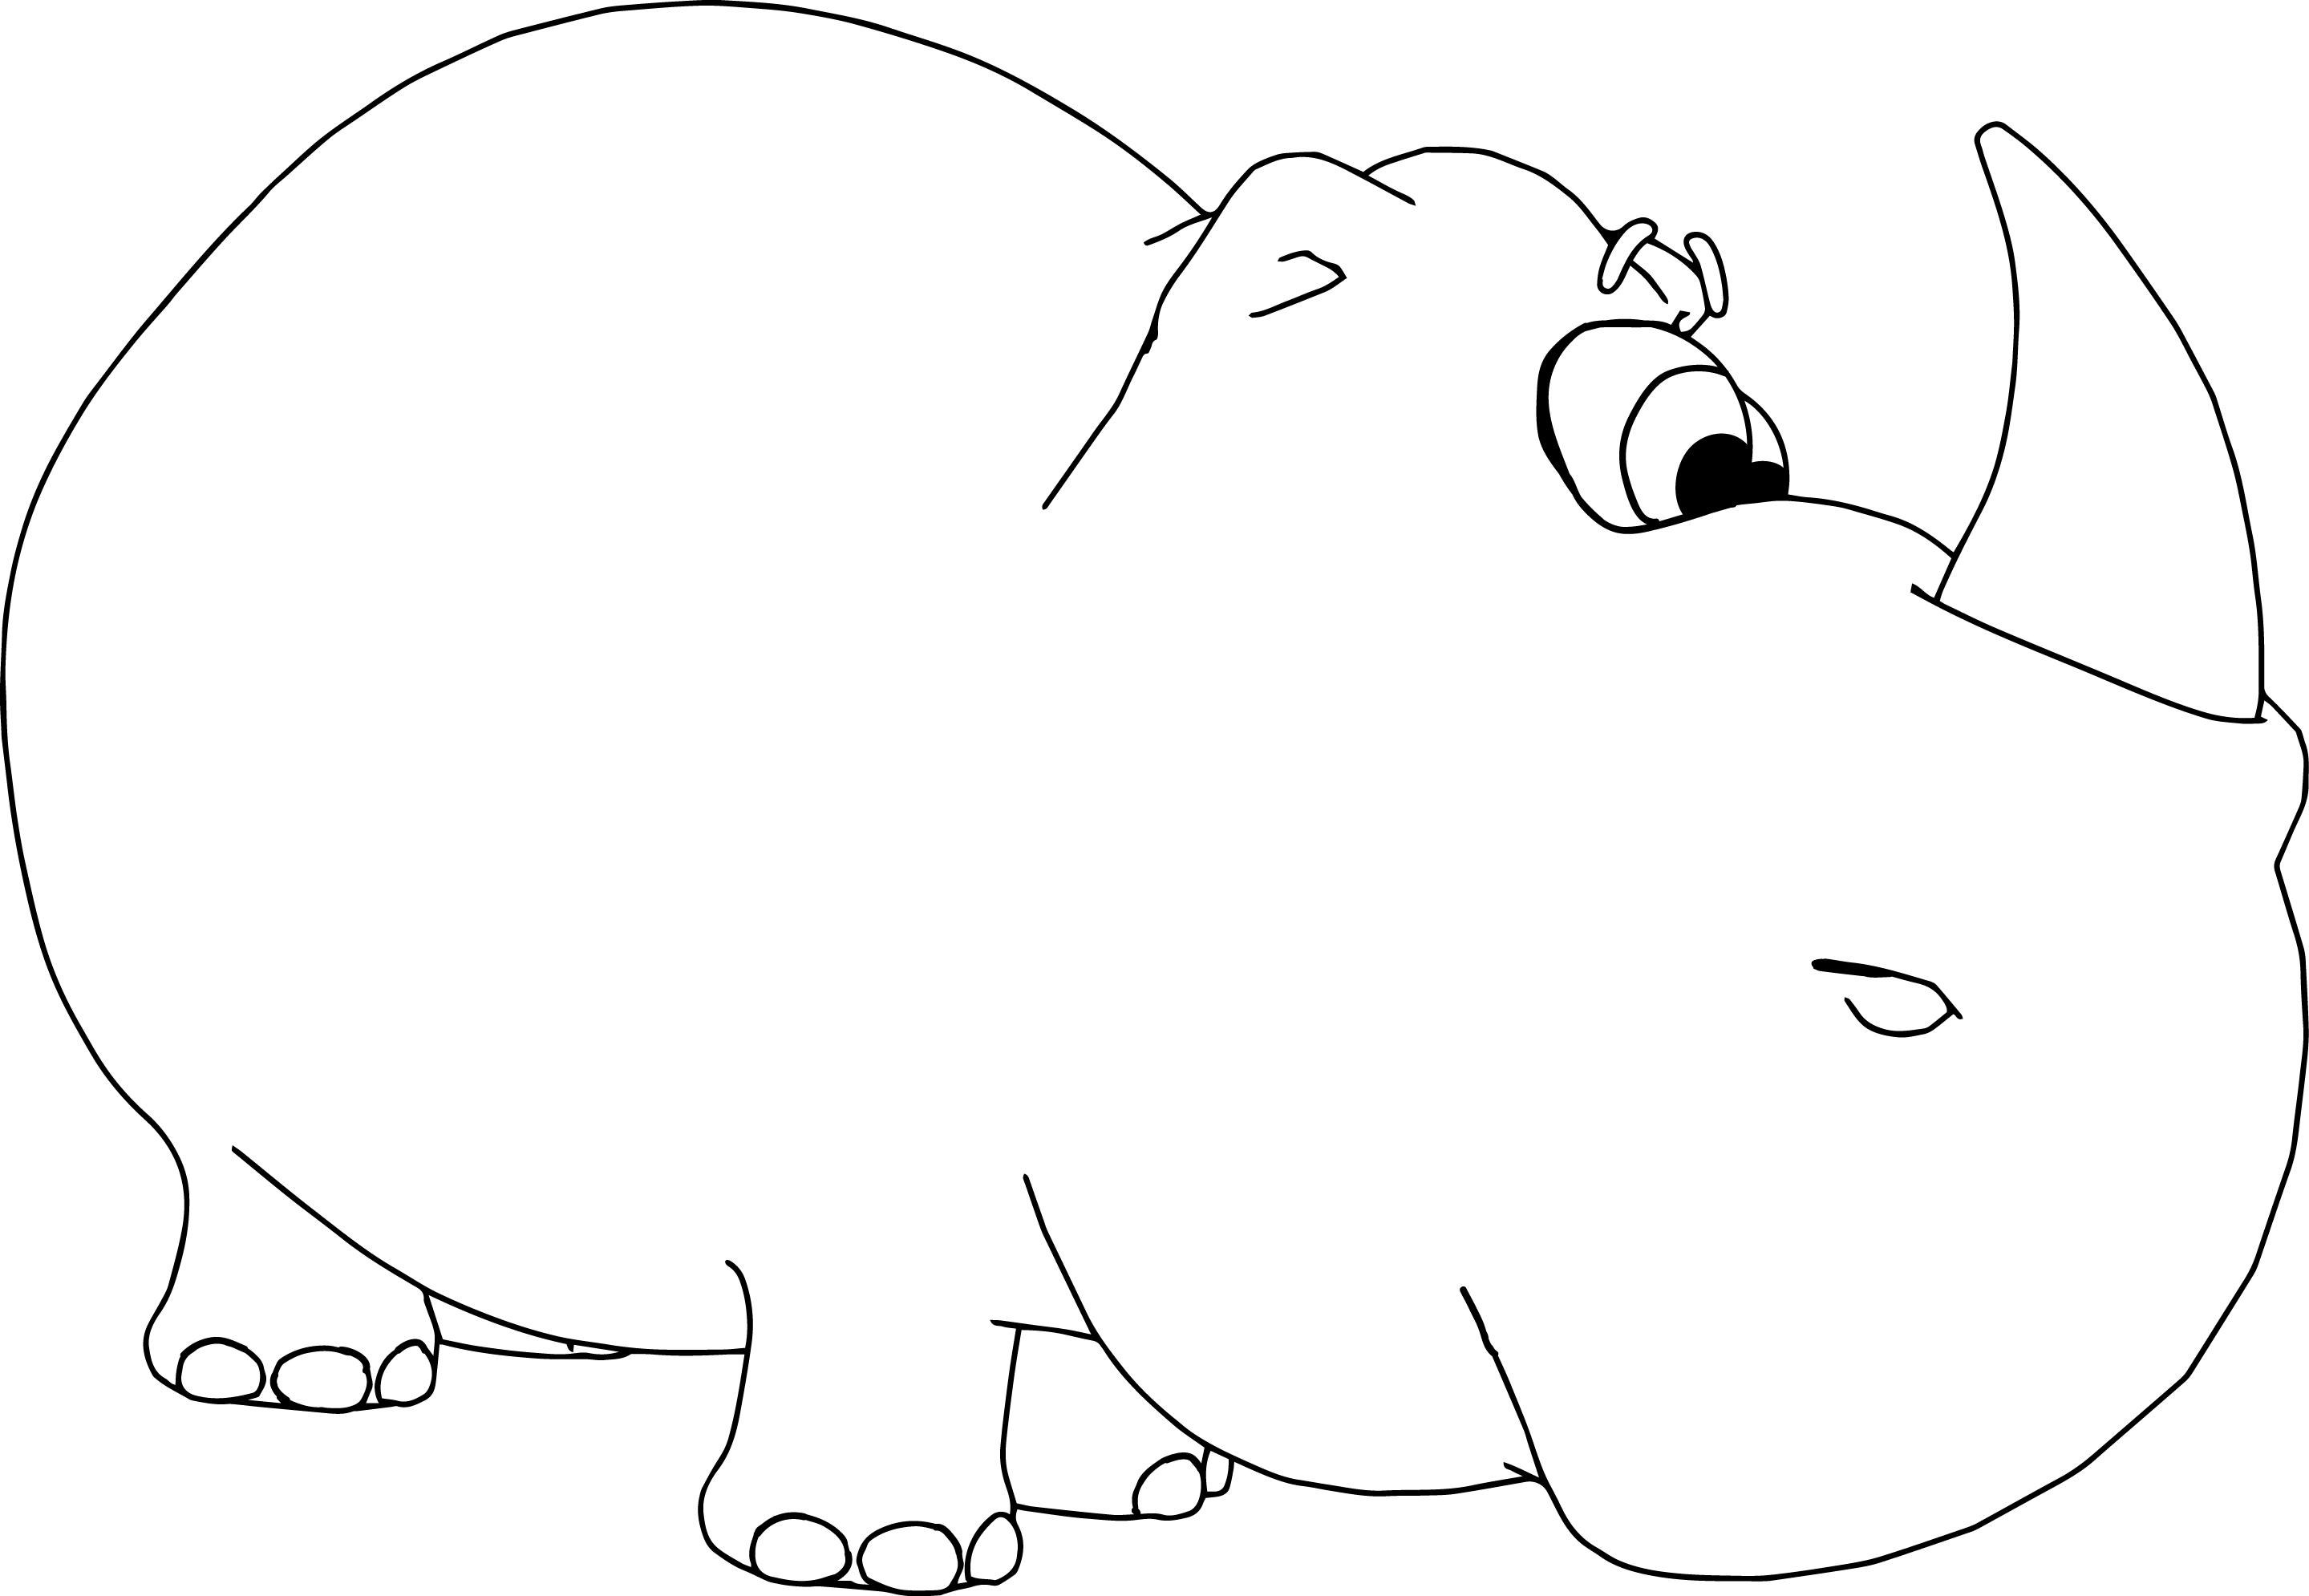 Rhinoceros Coloring Page Cartoon Free Download | Wecoloringpage.com